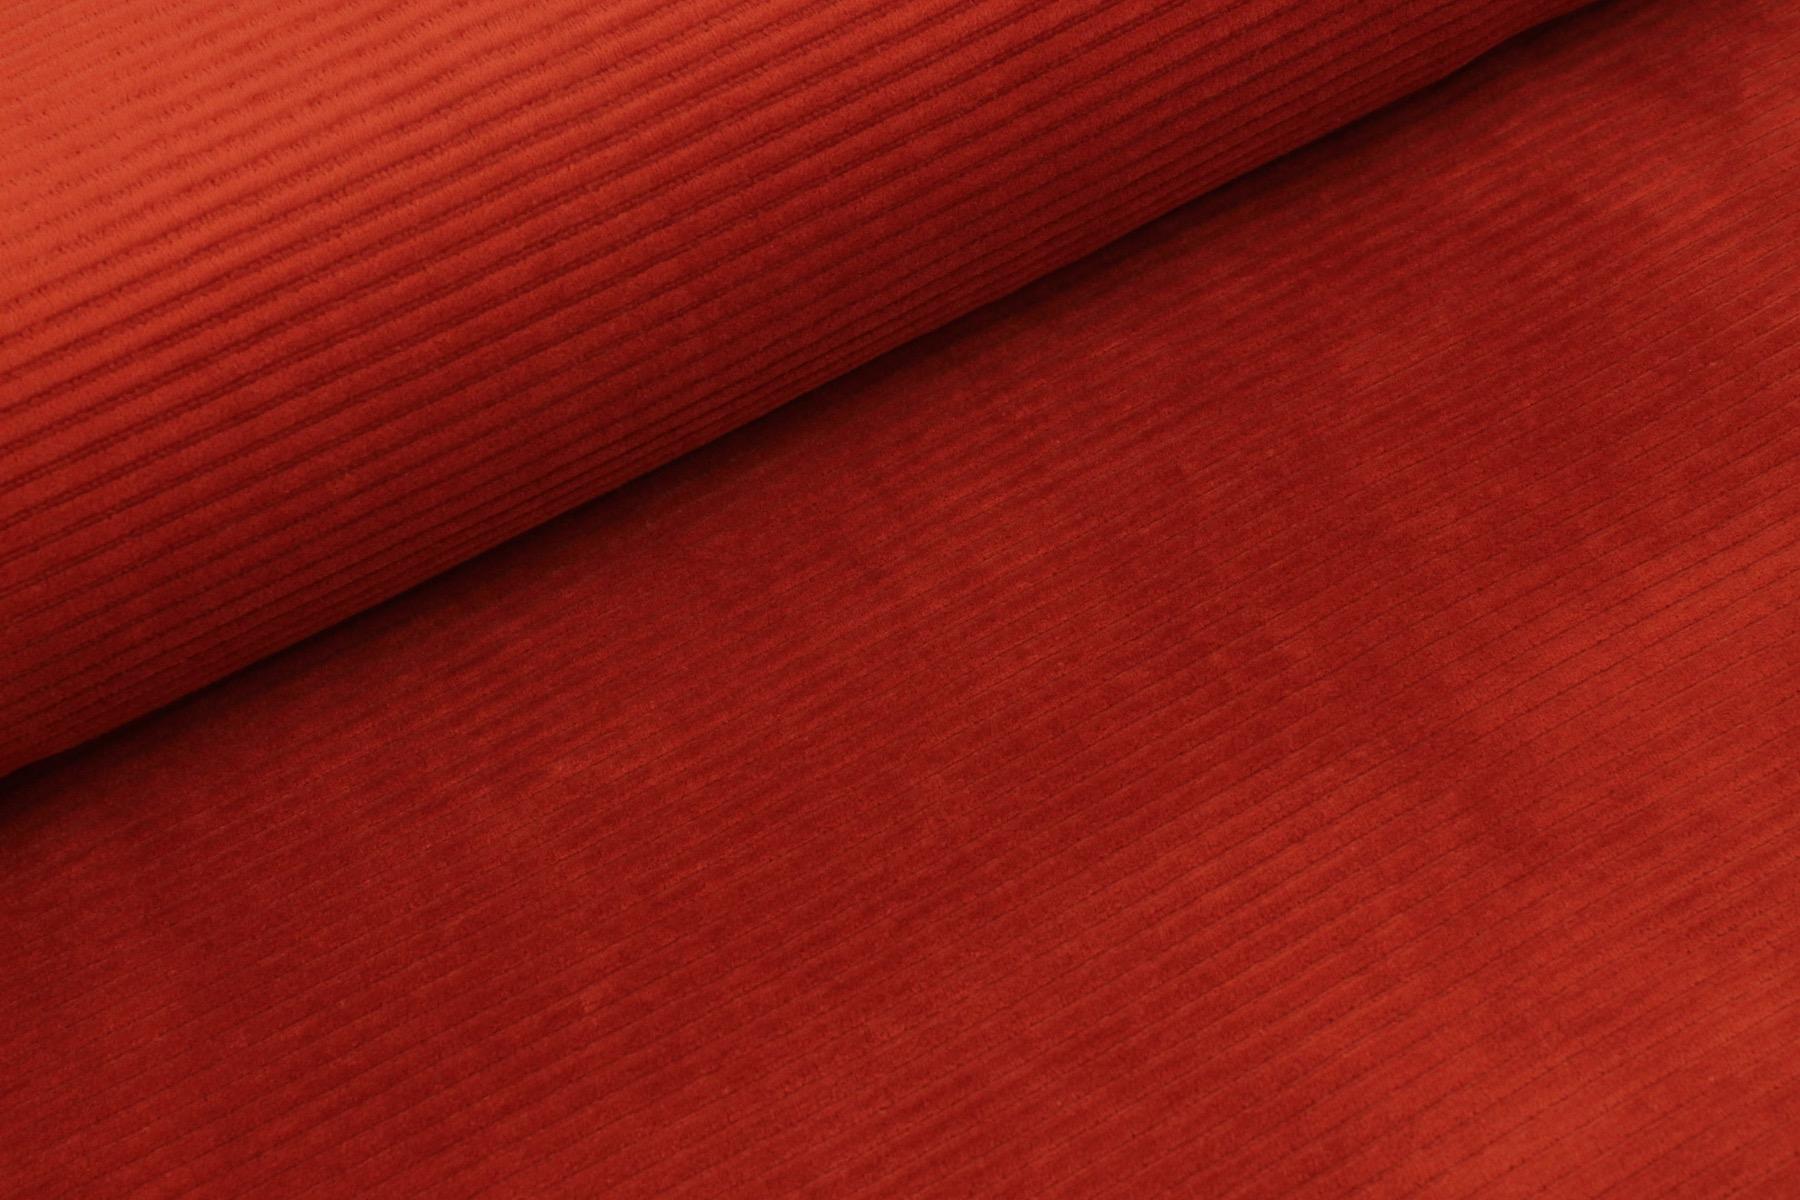 Cotton Knit Big Cord - Brick